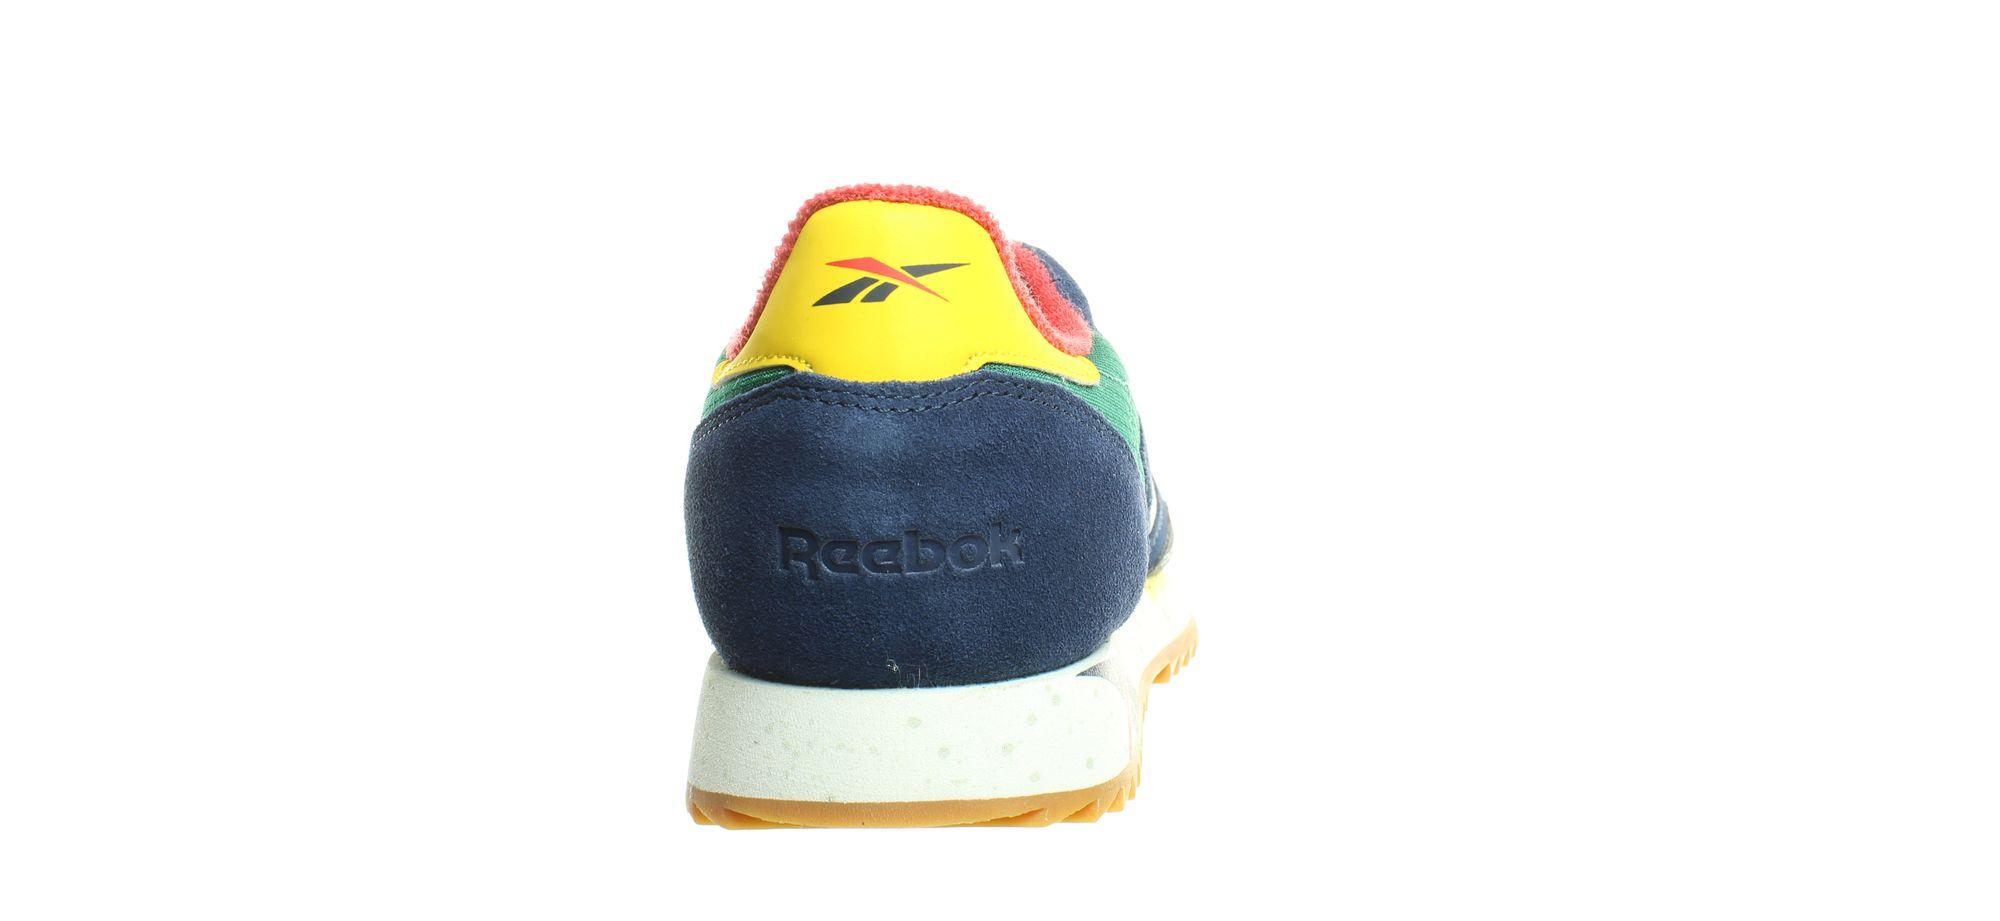 Reebok-Mens-Classic-Leather-Ripple-Fashion-Sneakers thumbnail 16